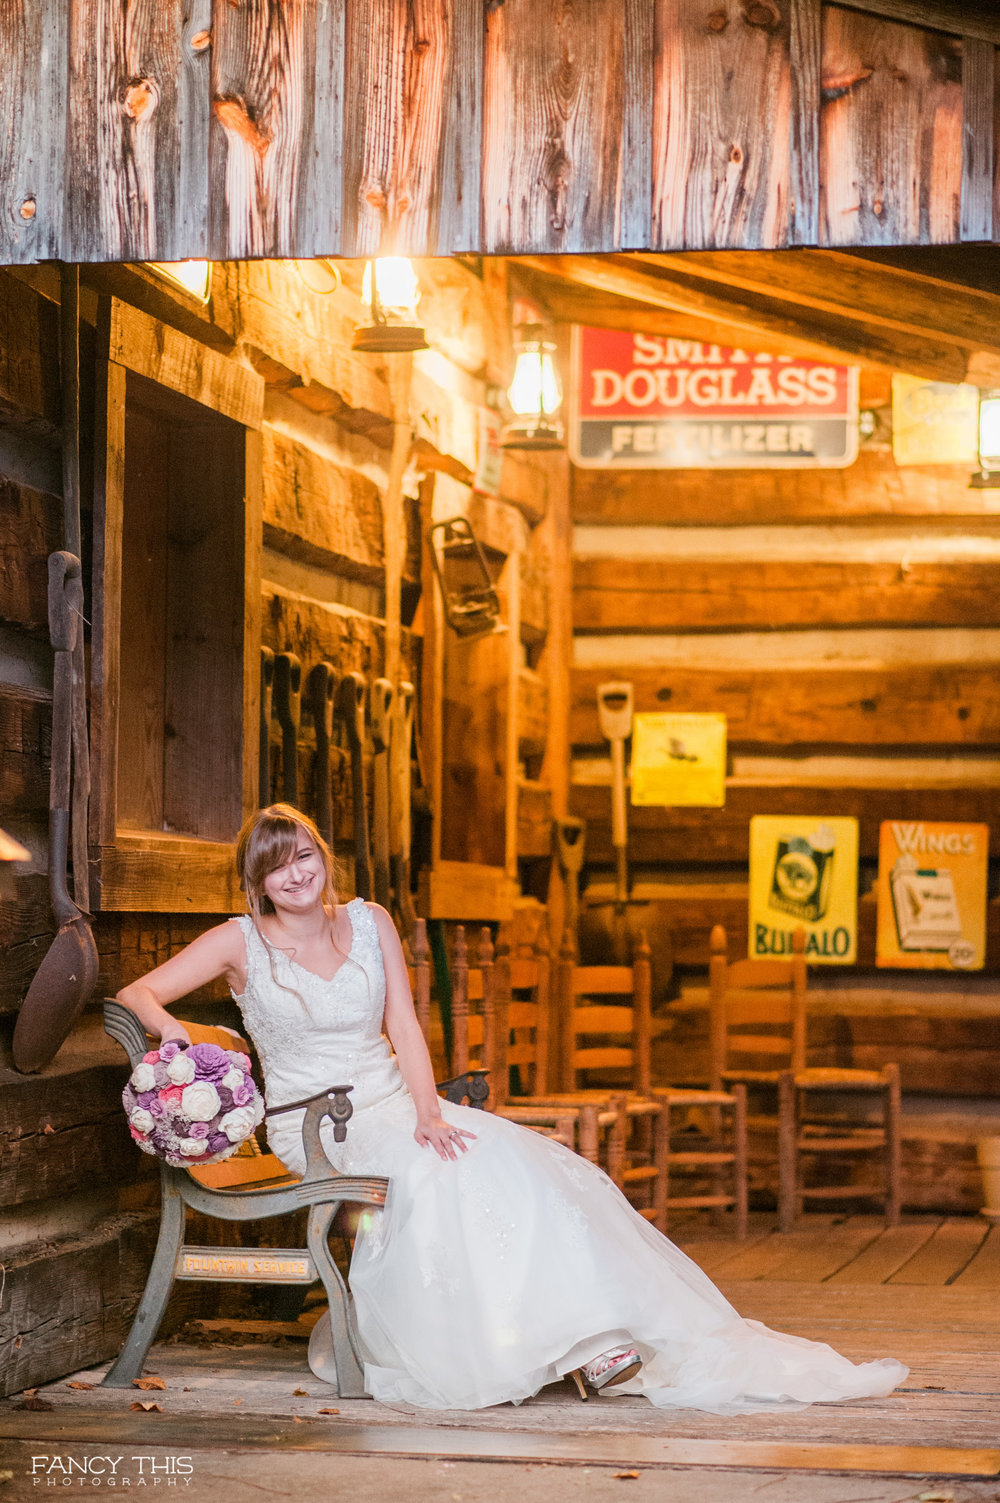 carolsimchik_bridals_socialmediaready-65.jpg